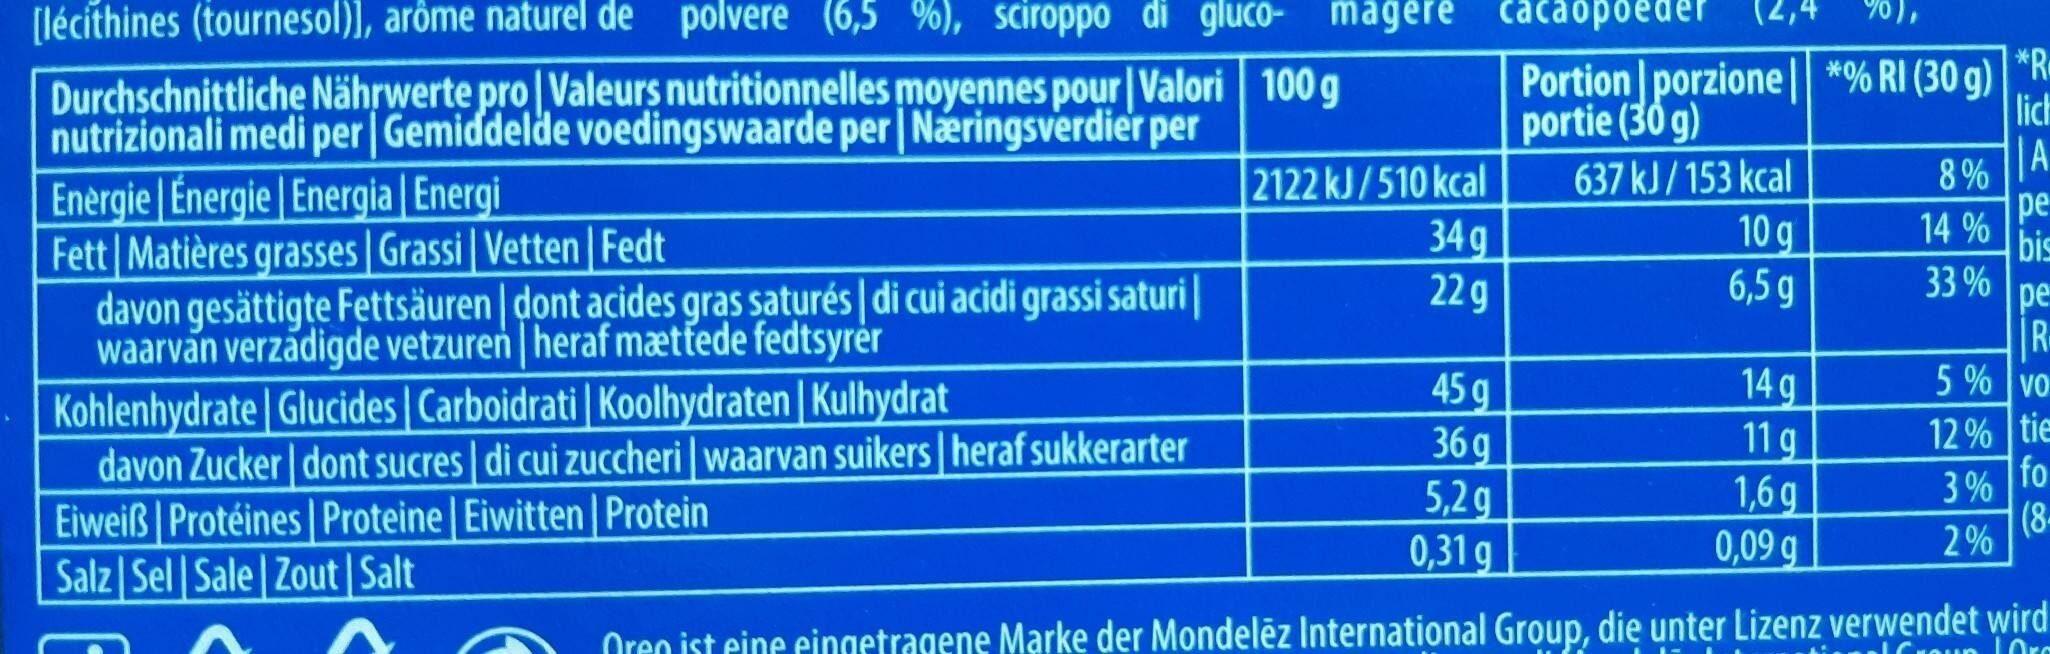 OREO Fresh Milk-Snack - Nutrition facts - fr